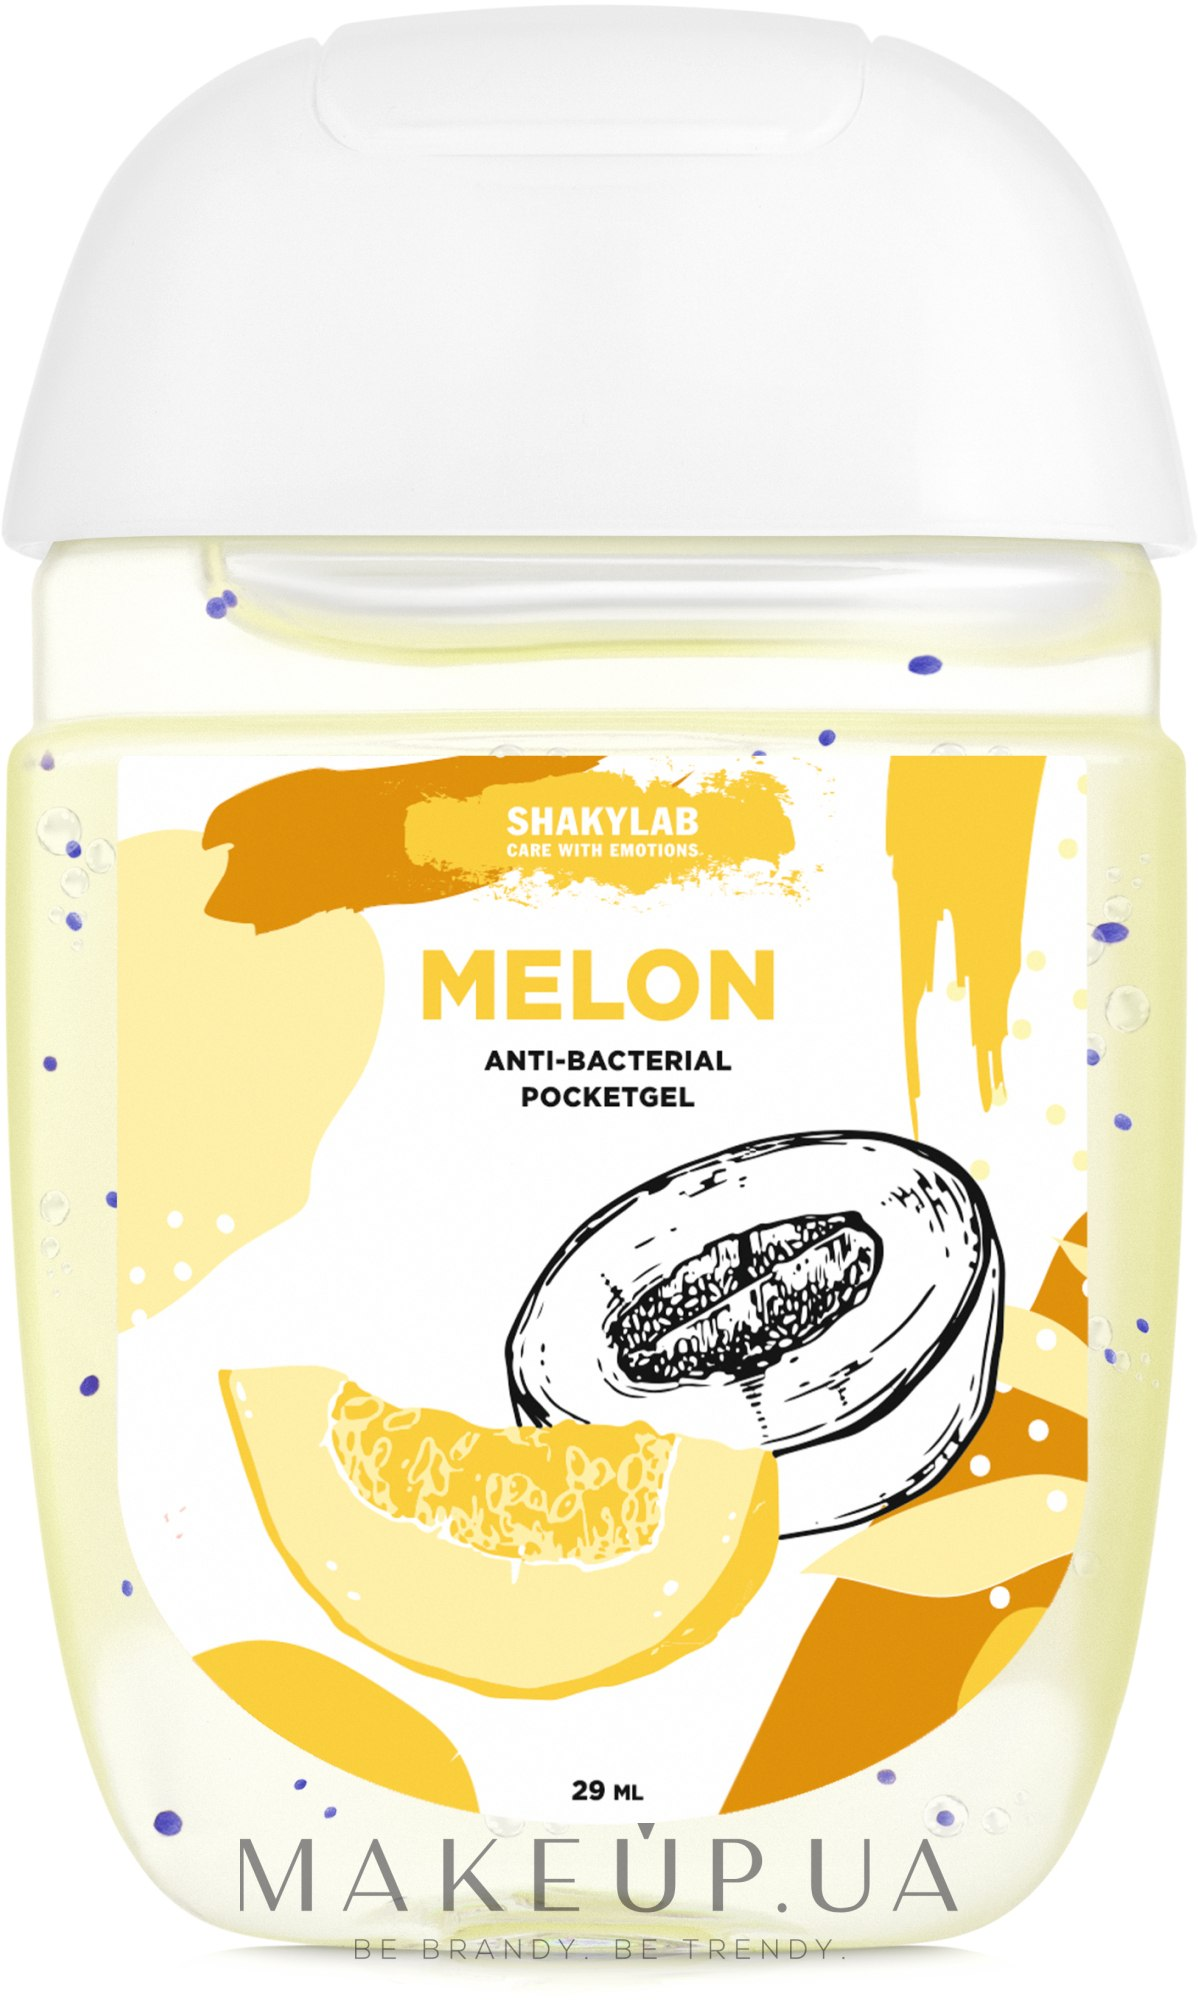 "Антибактериальный гель для рук ""Melon"" - SHAKYLAB Anti-Bacterial Pocket Gel — фото 29ml"